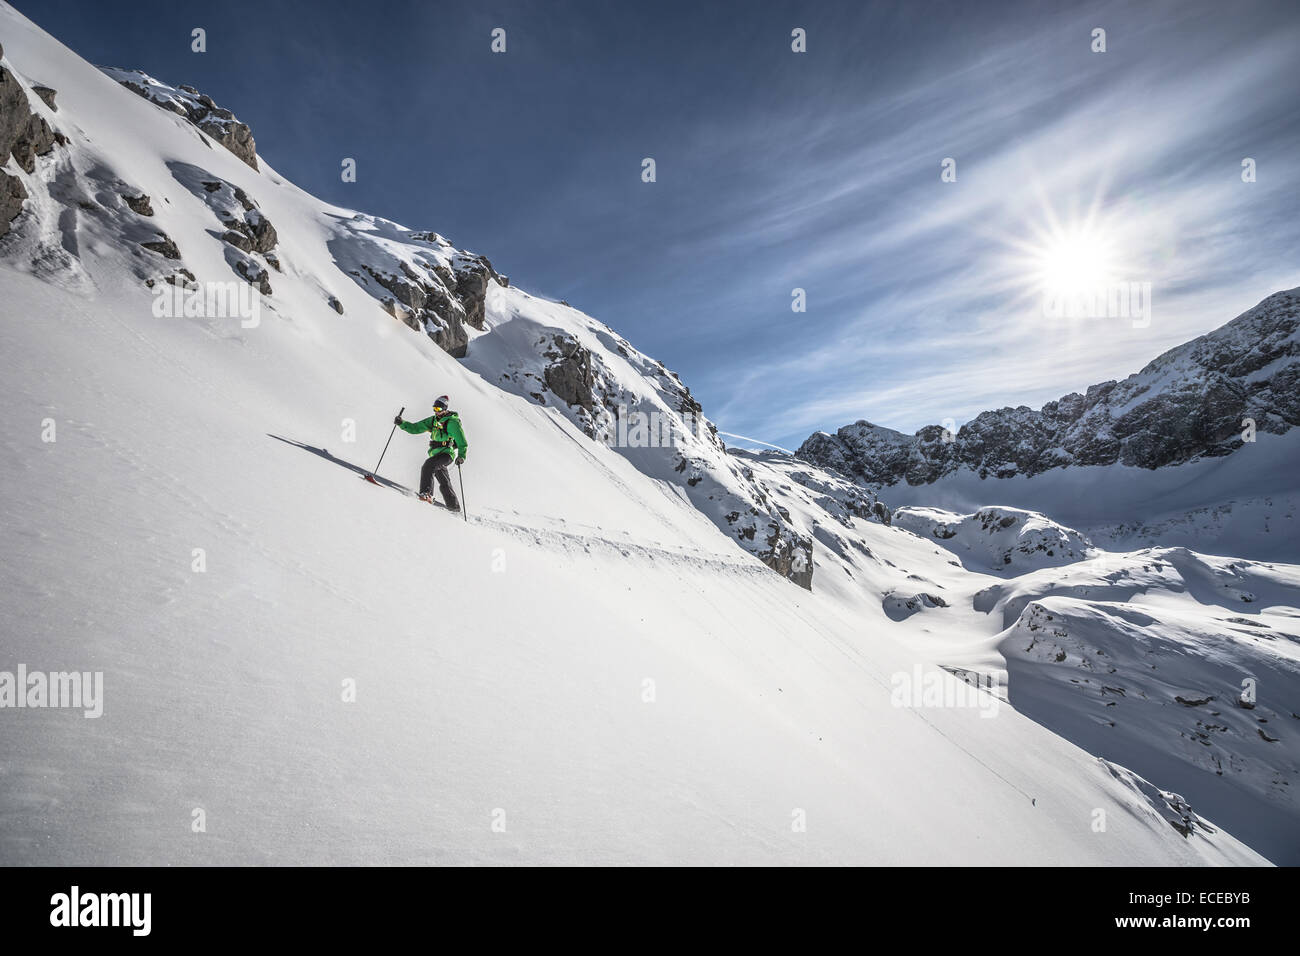 Austria, maschio sciatore voce in salita Immagini Stock